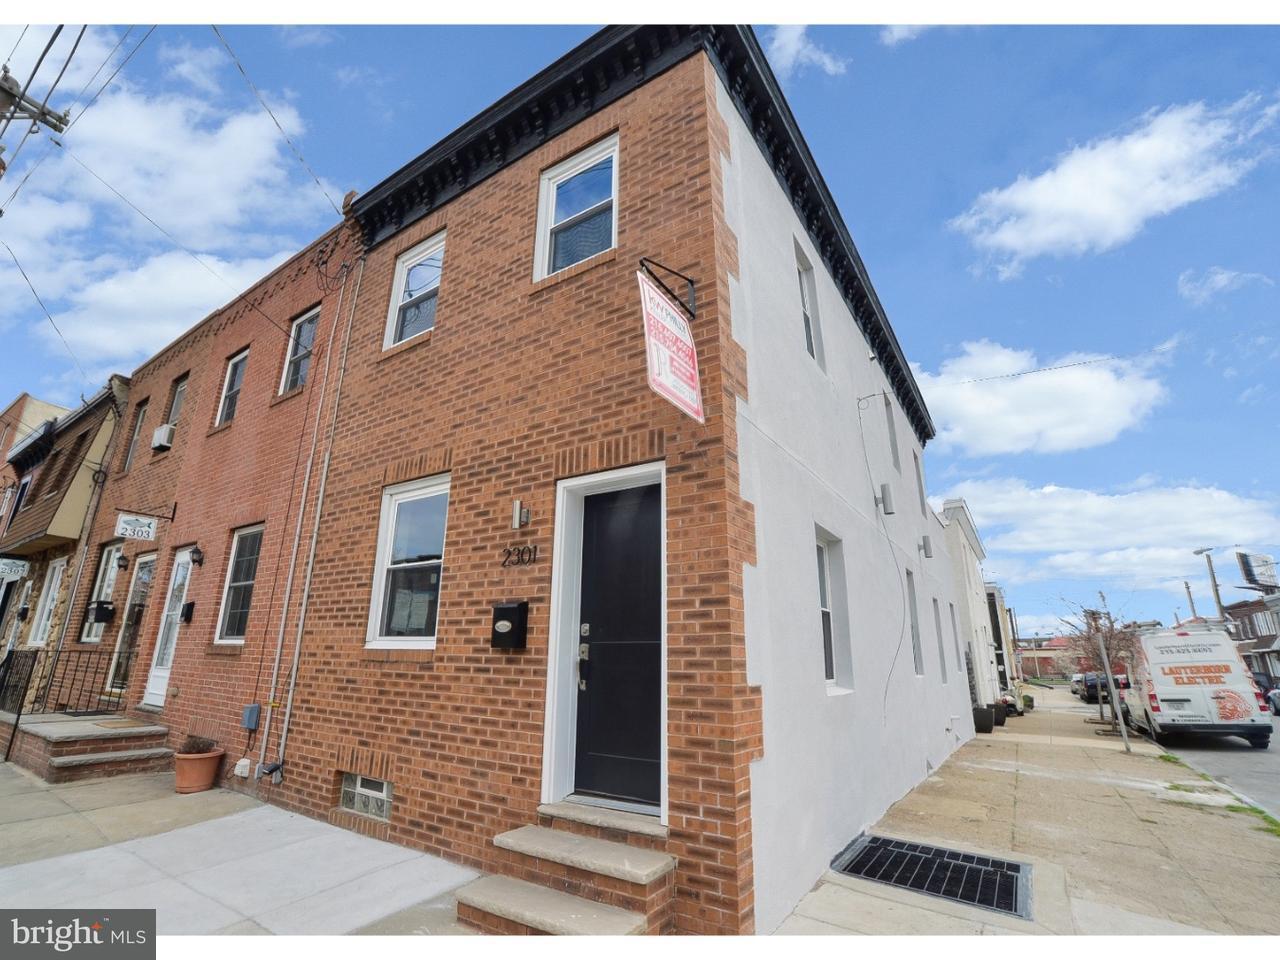 2301 E Thompson Street Philadelphia, PA 19125